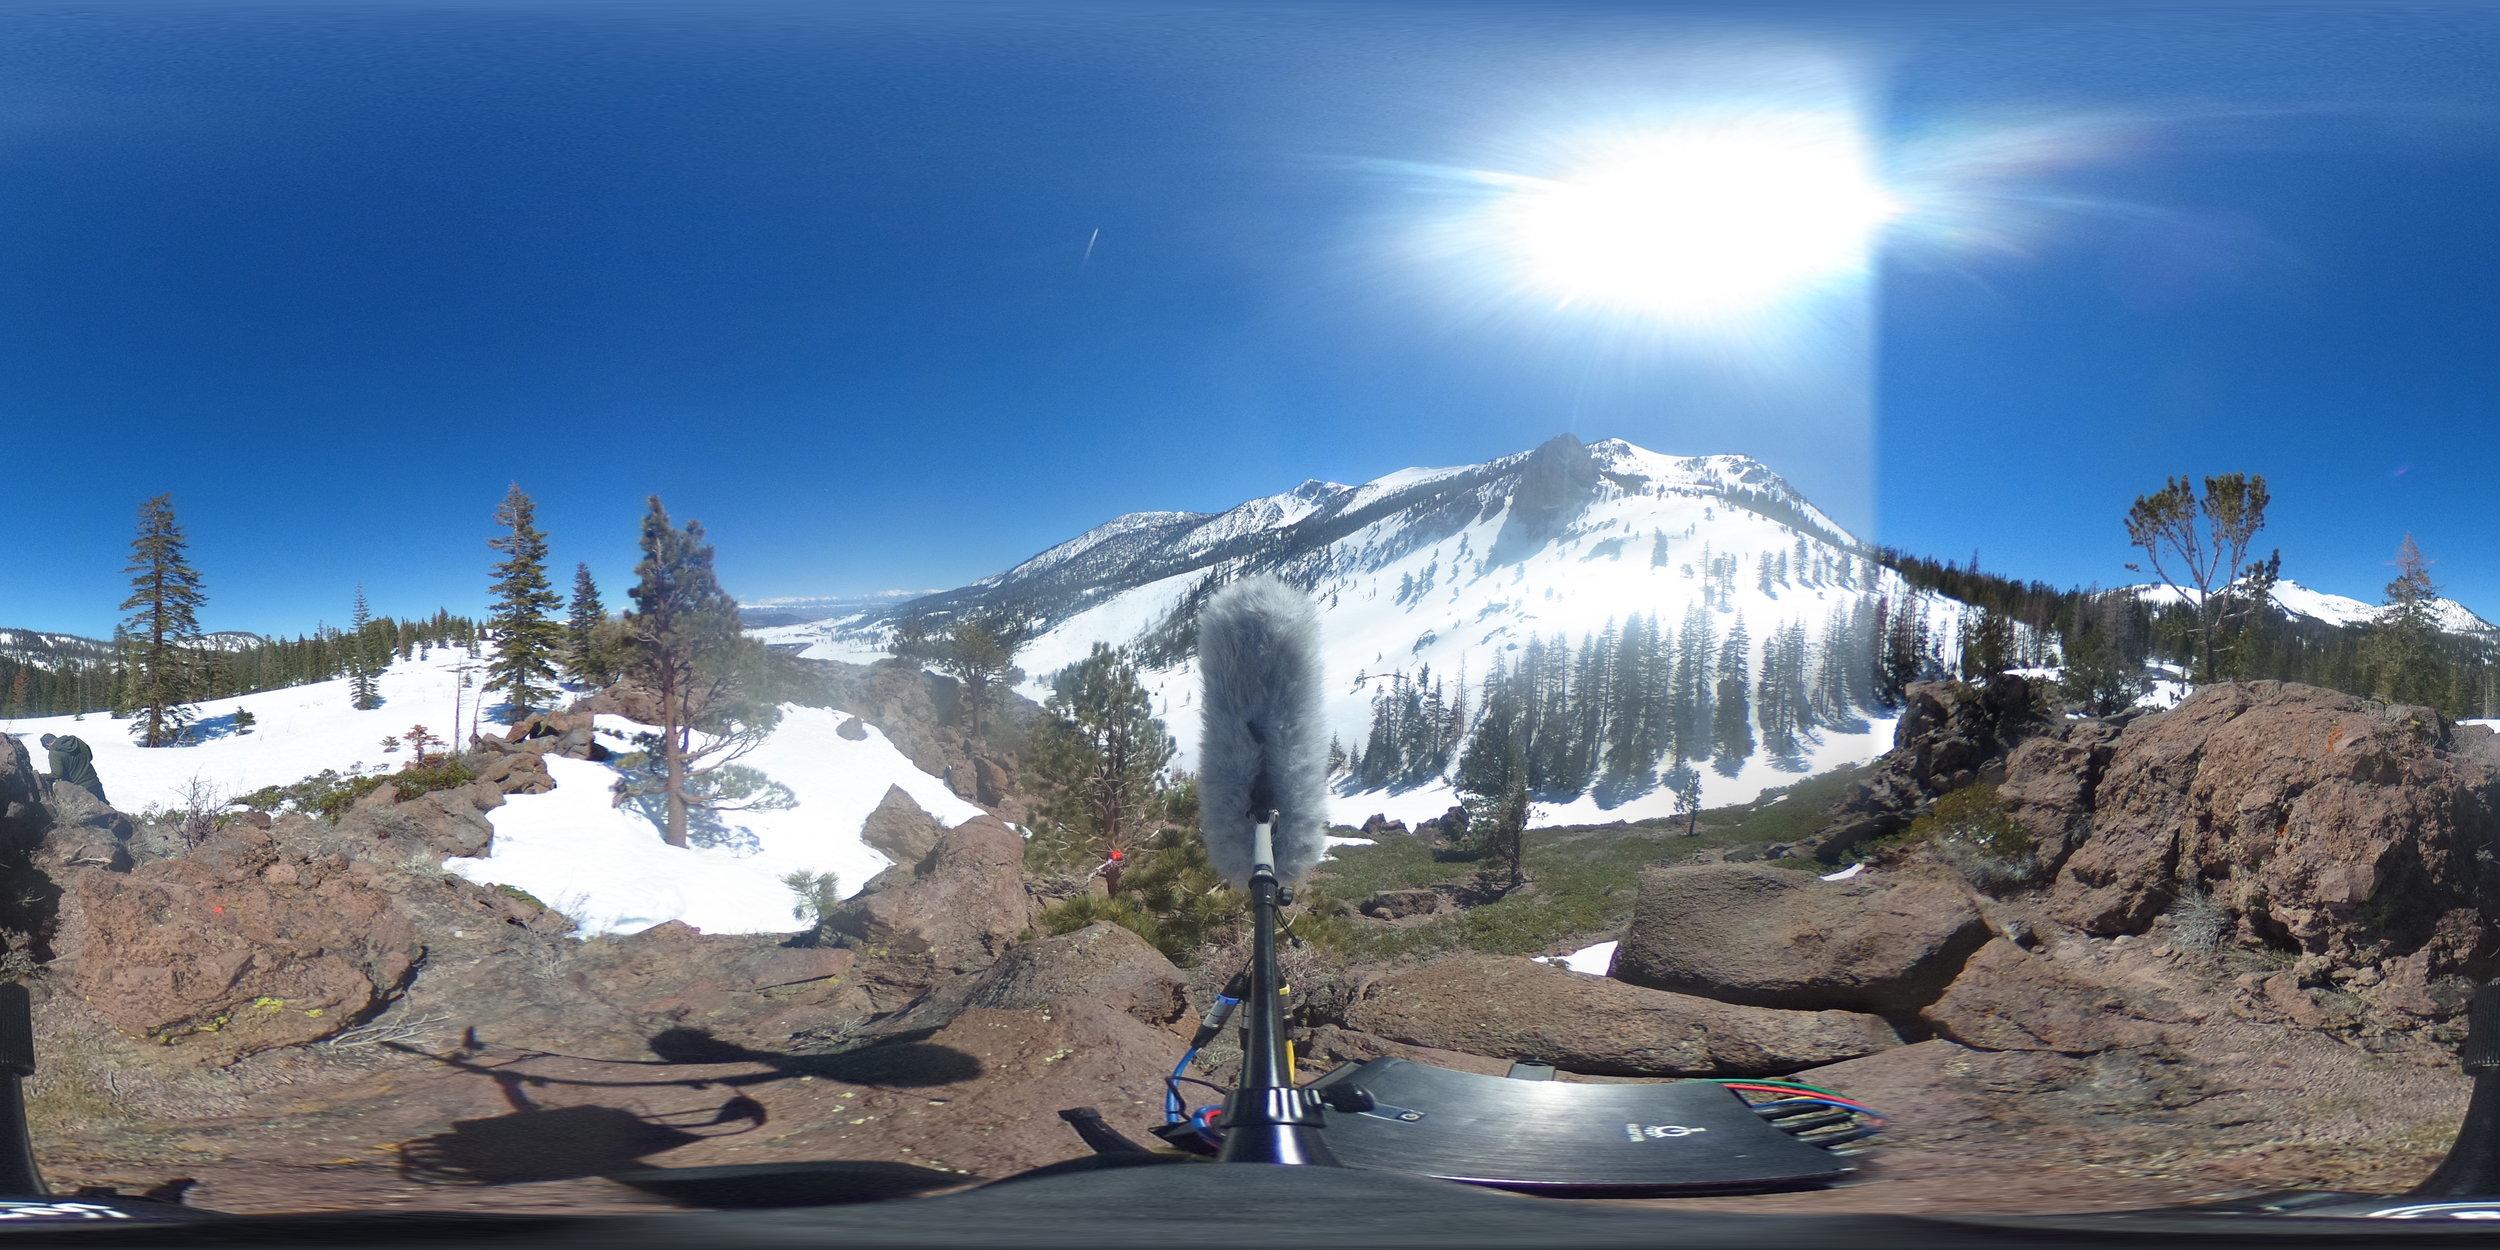 EXT_Day_Snow_Canyon_ColdWindThroughPine_OccasionalBirdChirpAndSquawk_DistantCityHum_DistantPlanes_JPEG.JPG